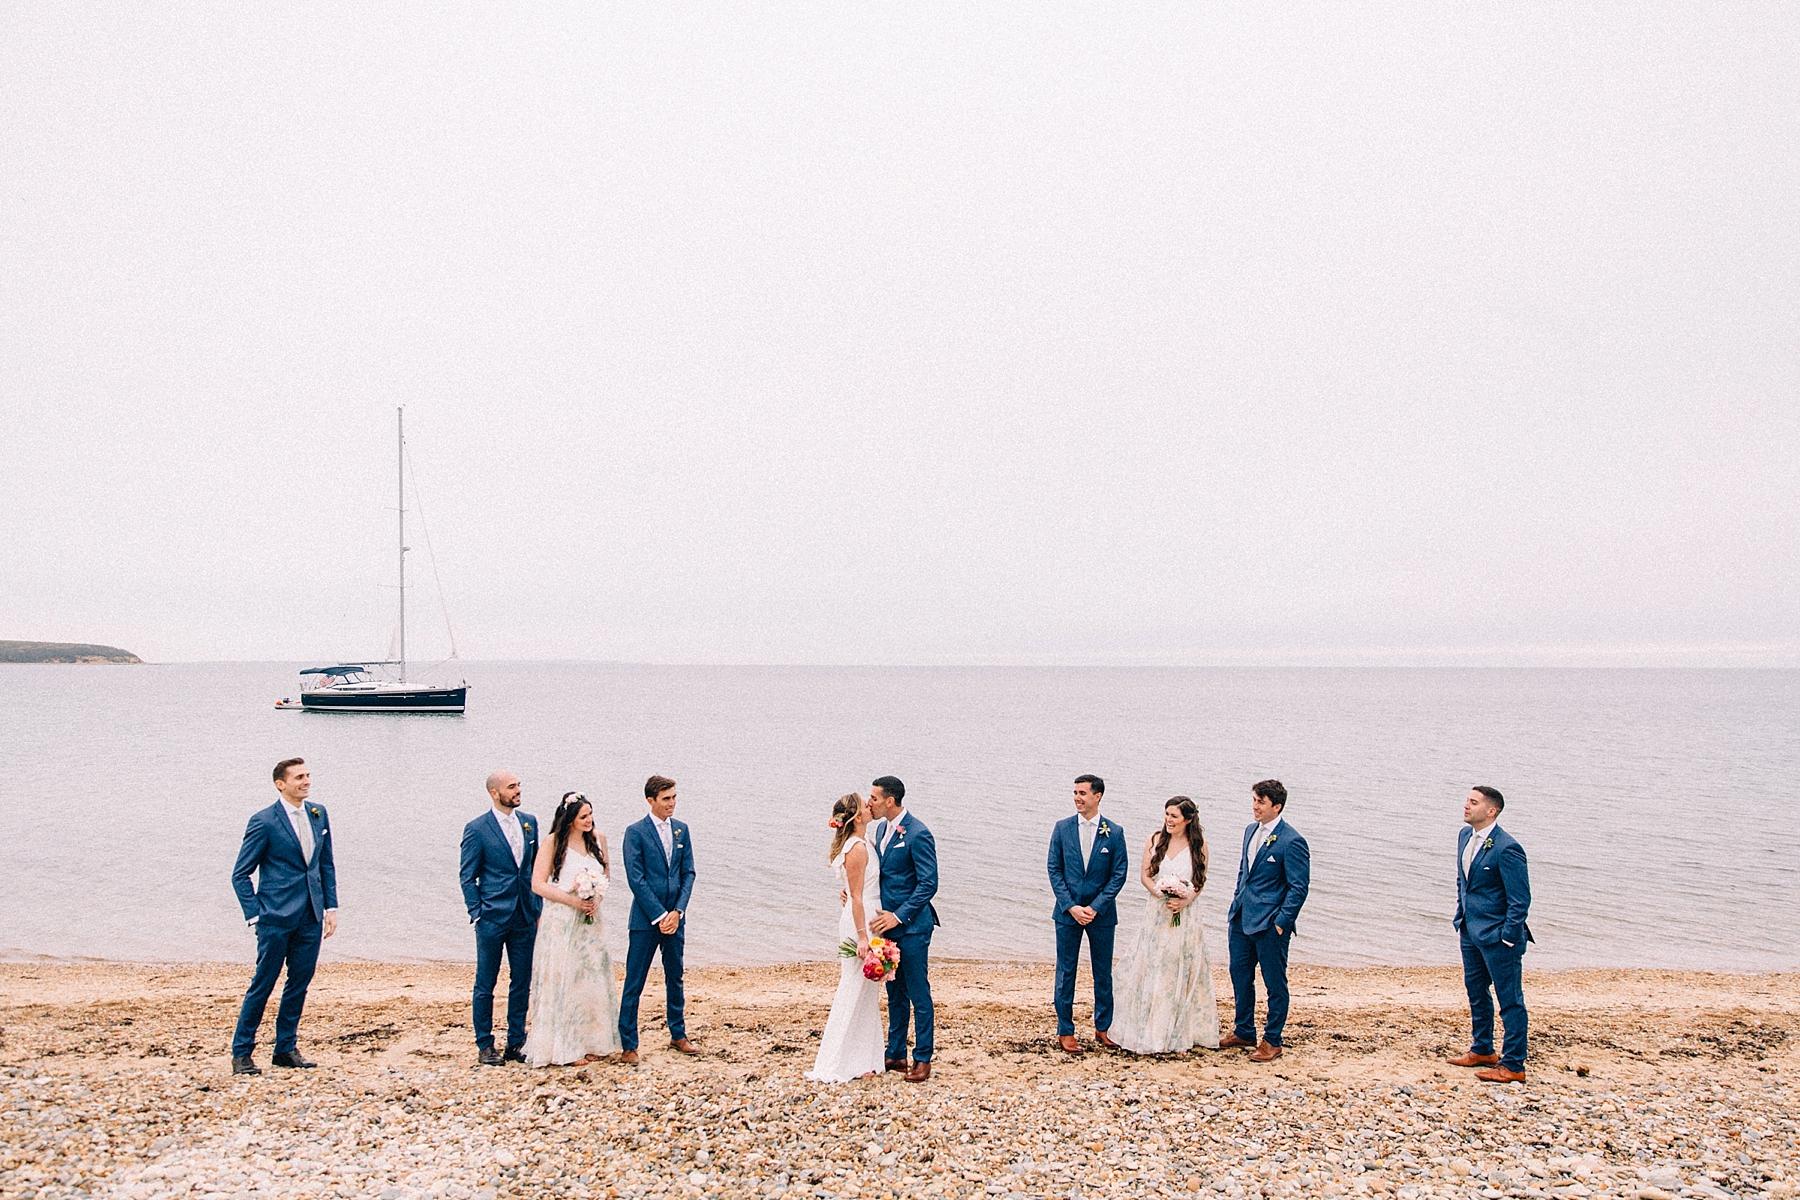 montauk-wedding-photography-rainy-navy-beach_0037.jpg